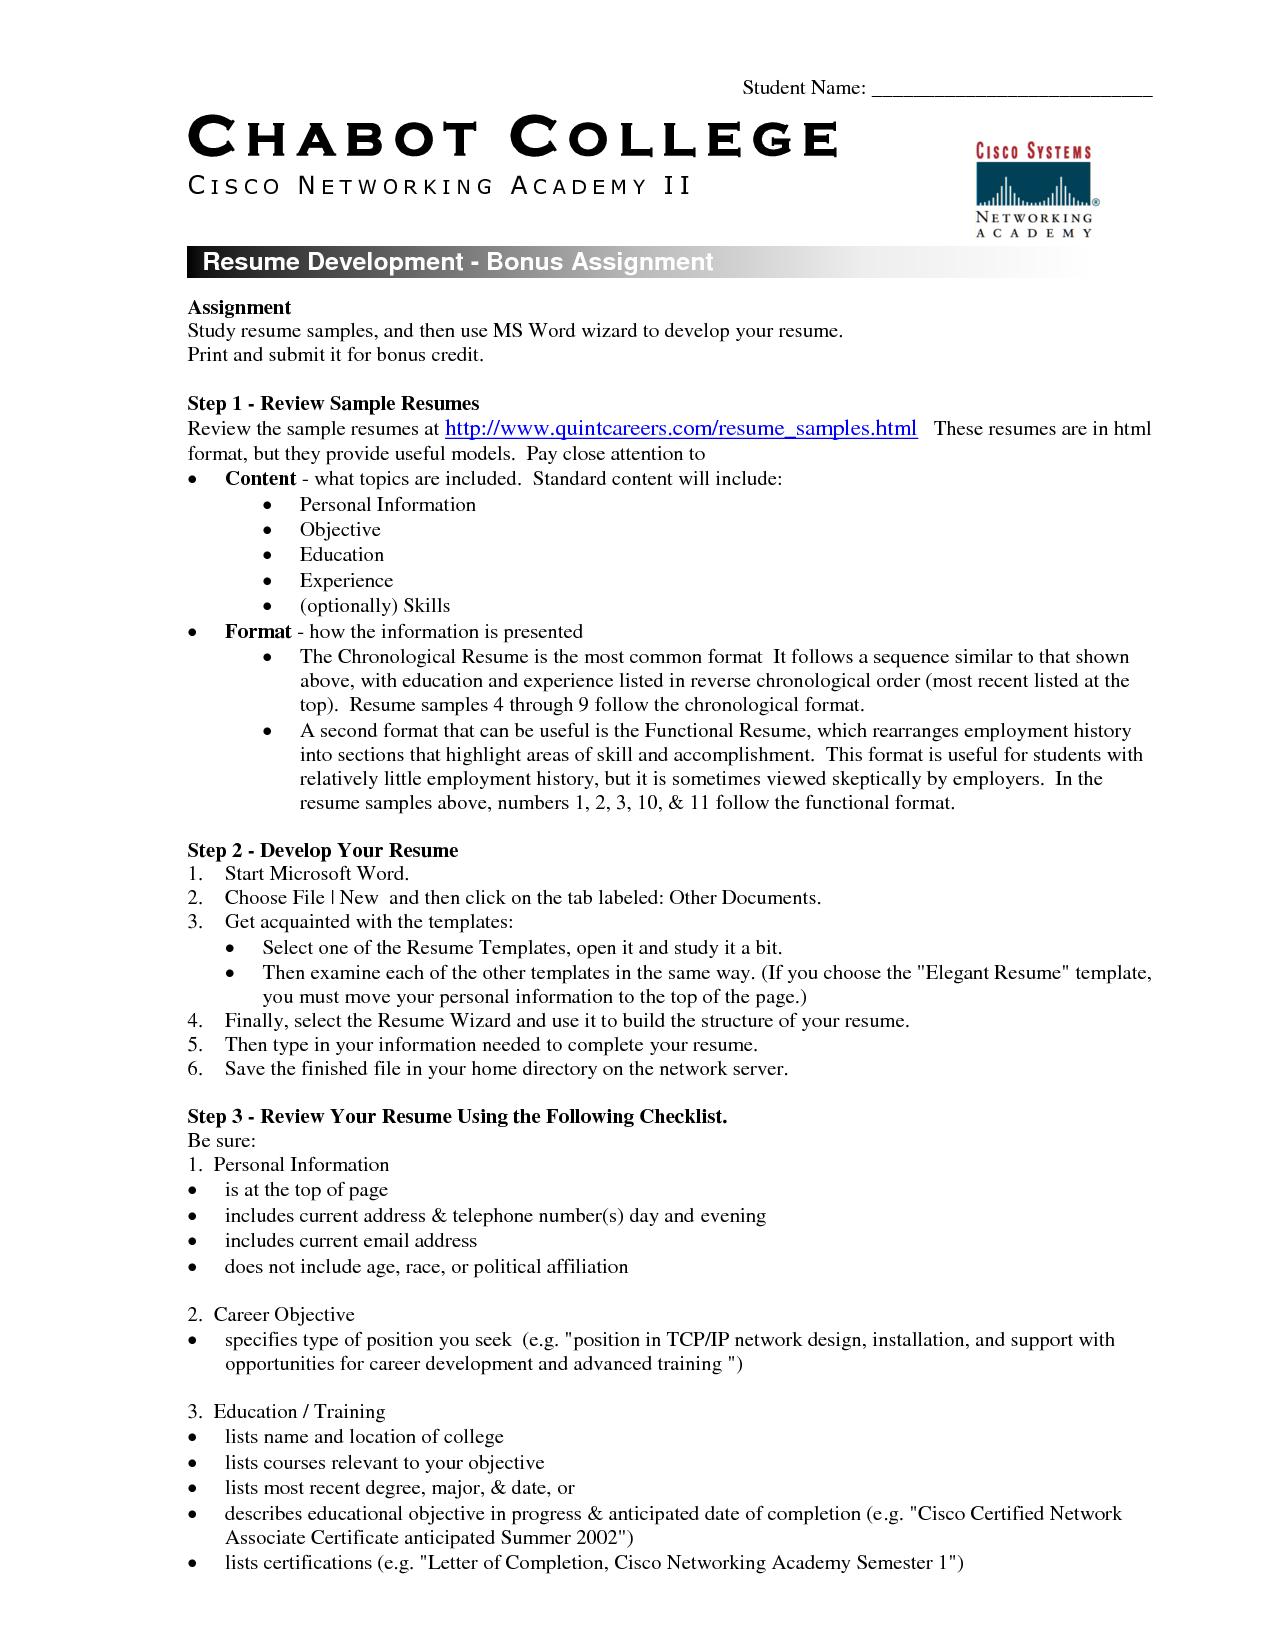 Resume Examples Reddit - Resume Examples